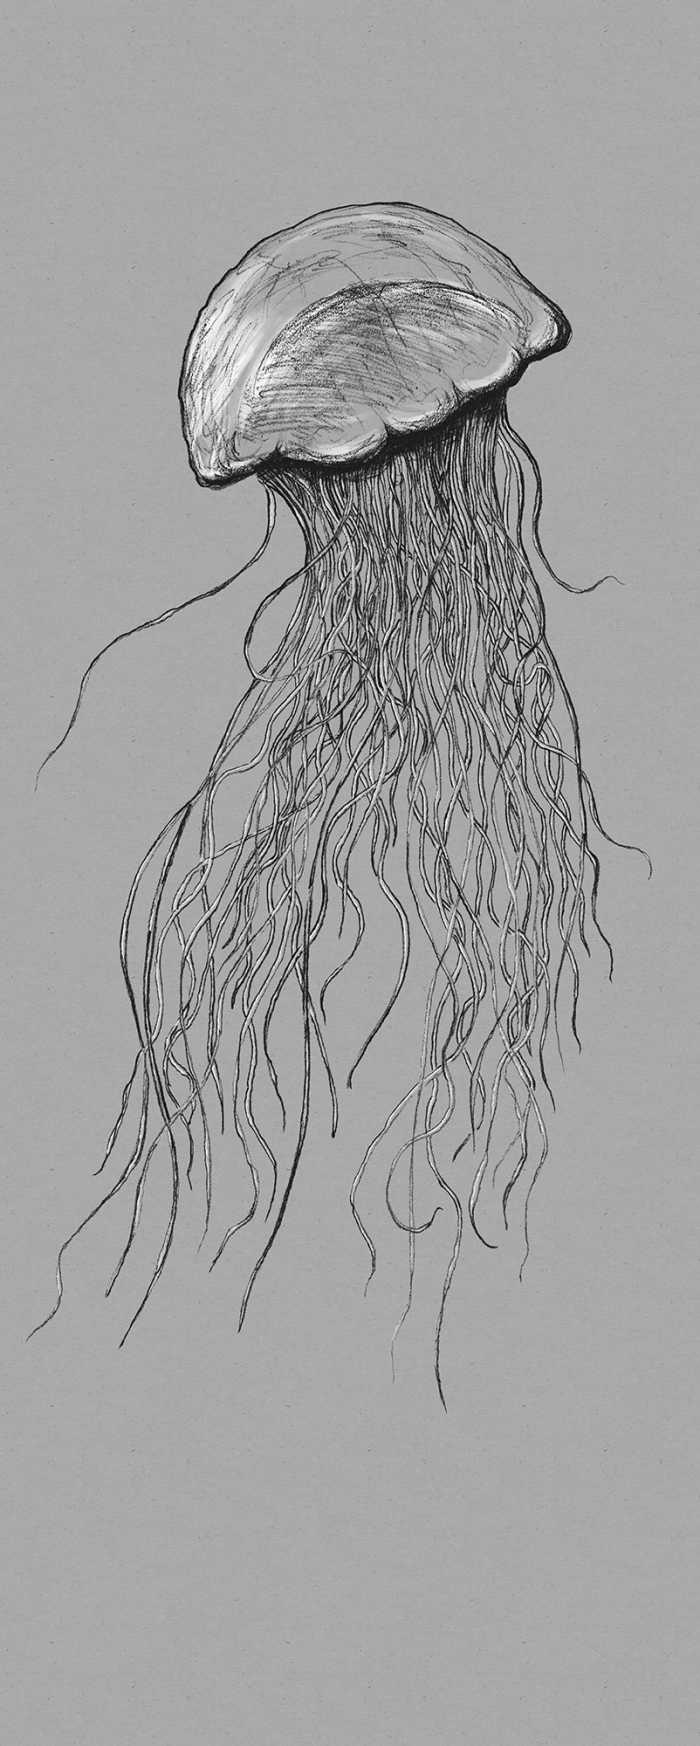 Digital wallpaper Jellyfish